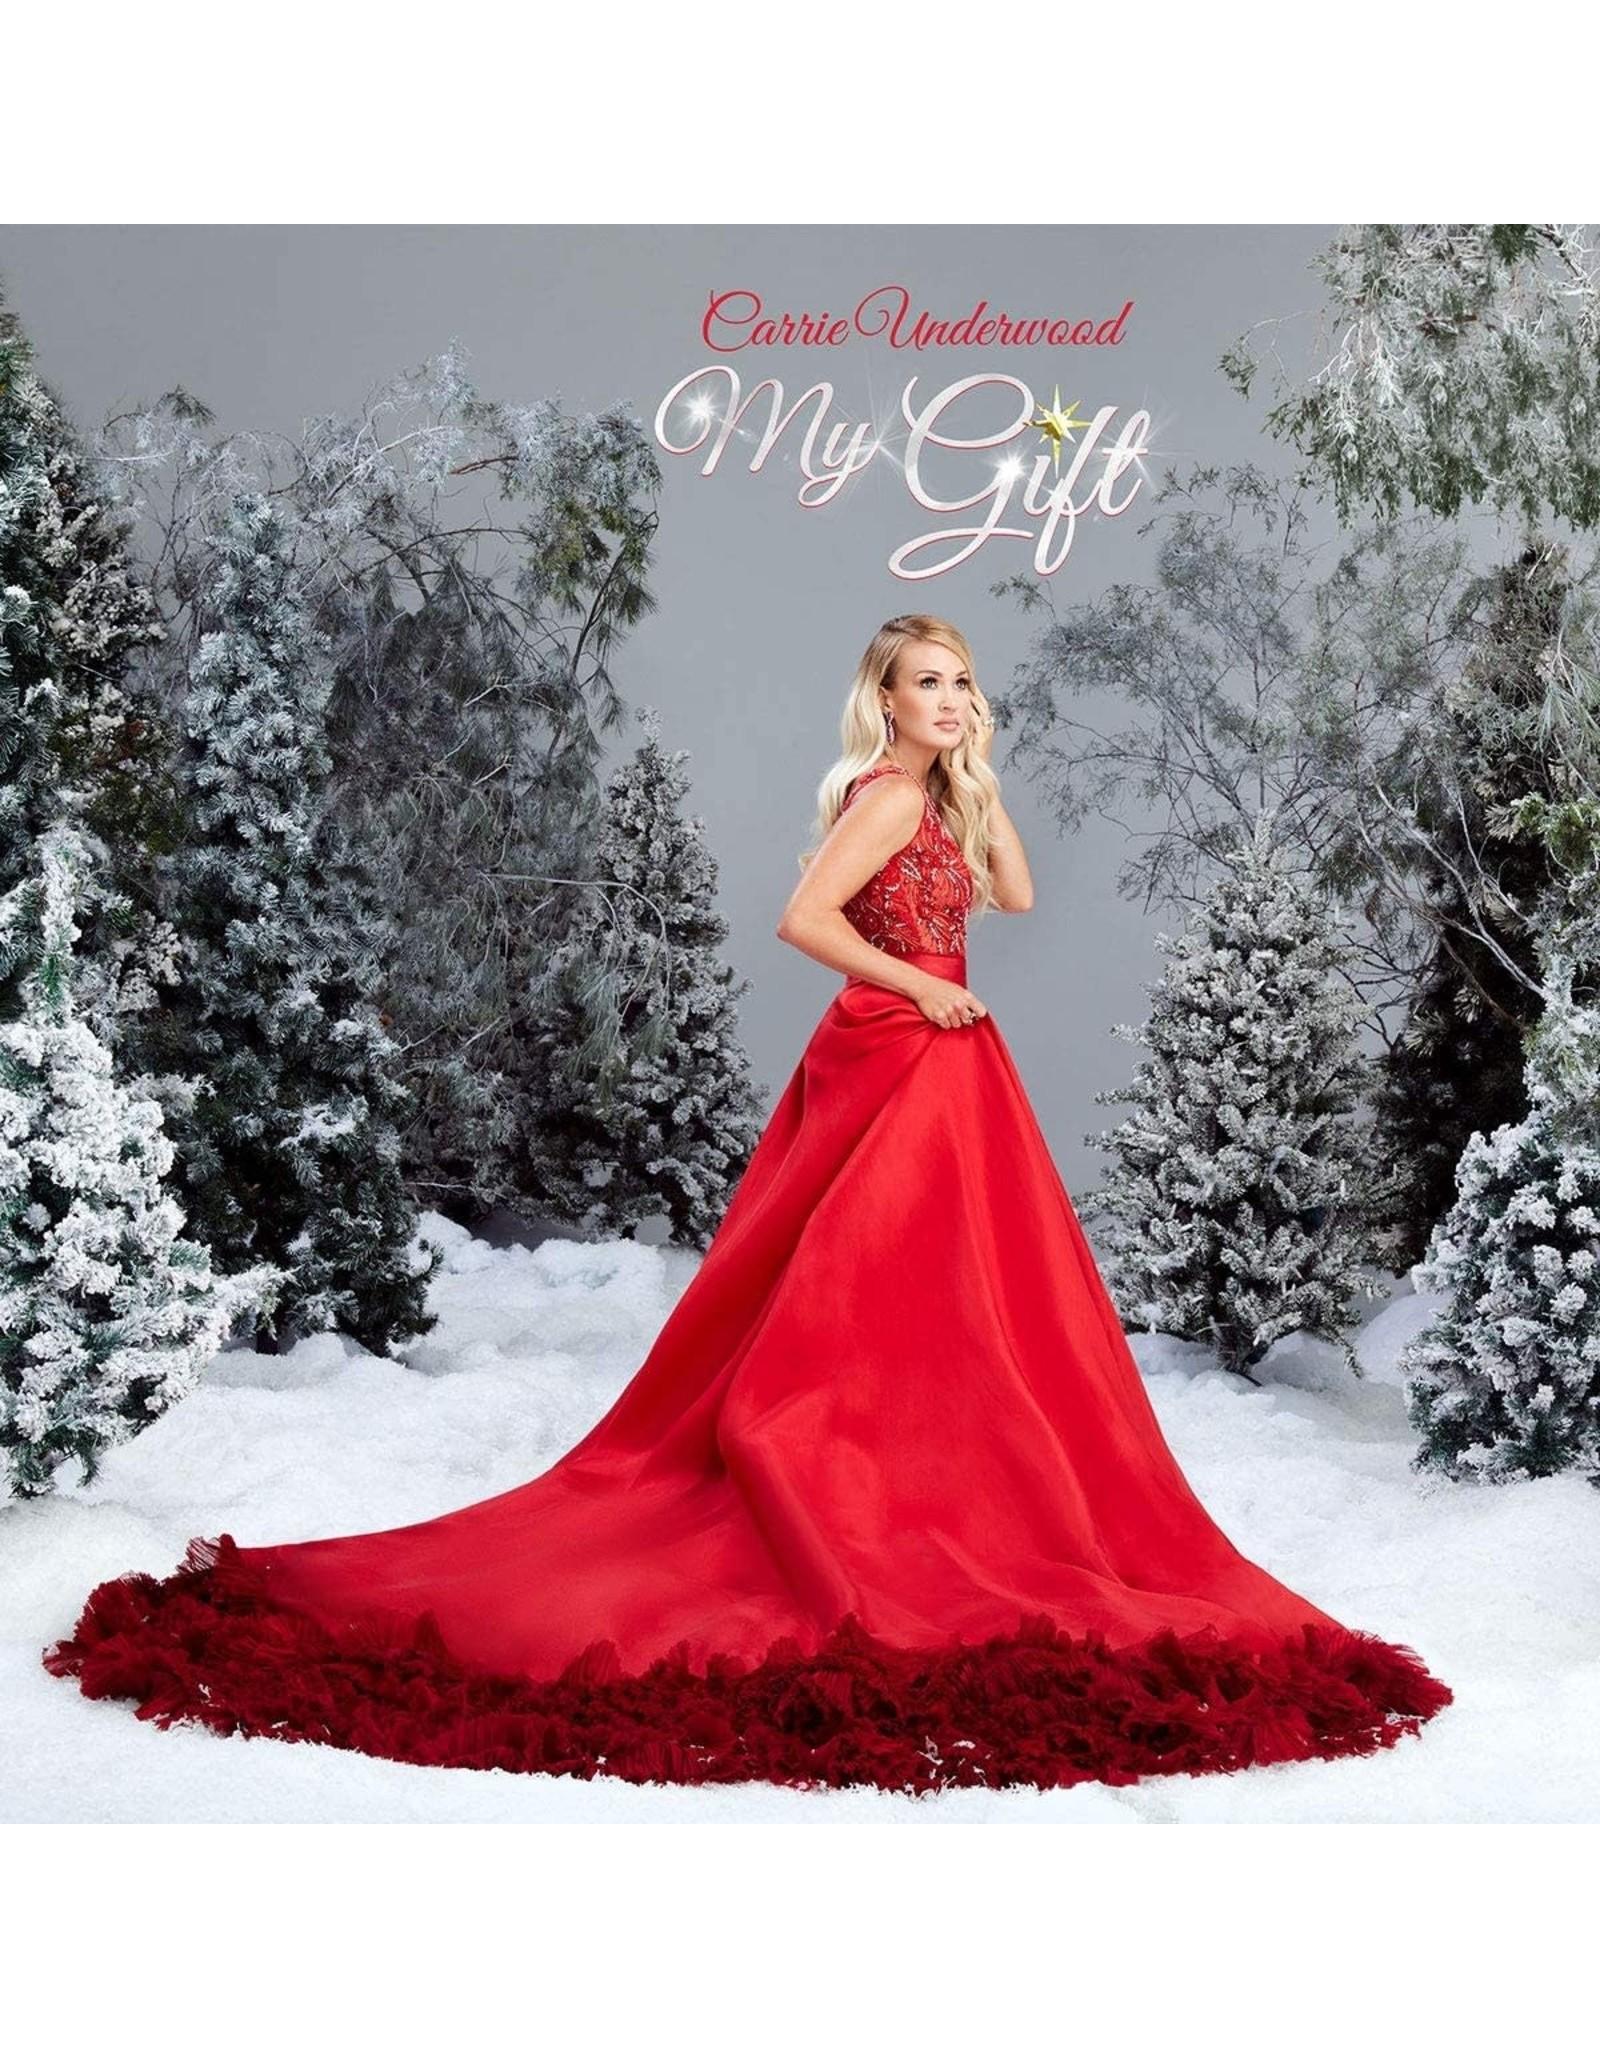 Carrie Underwood  - My Gift (Red Vinyl)